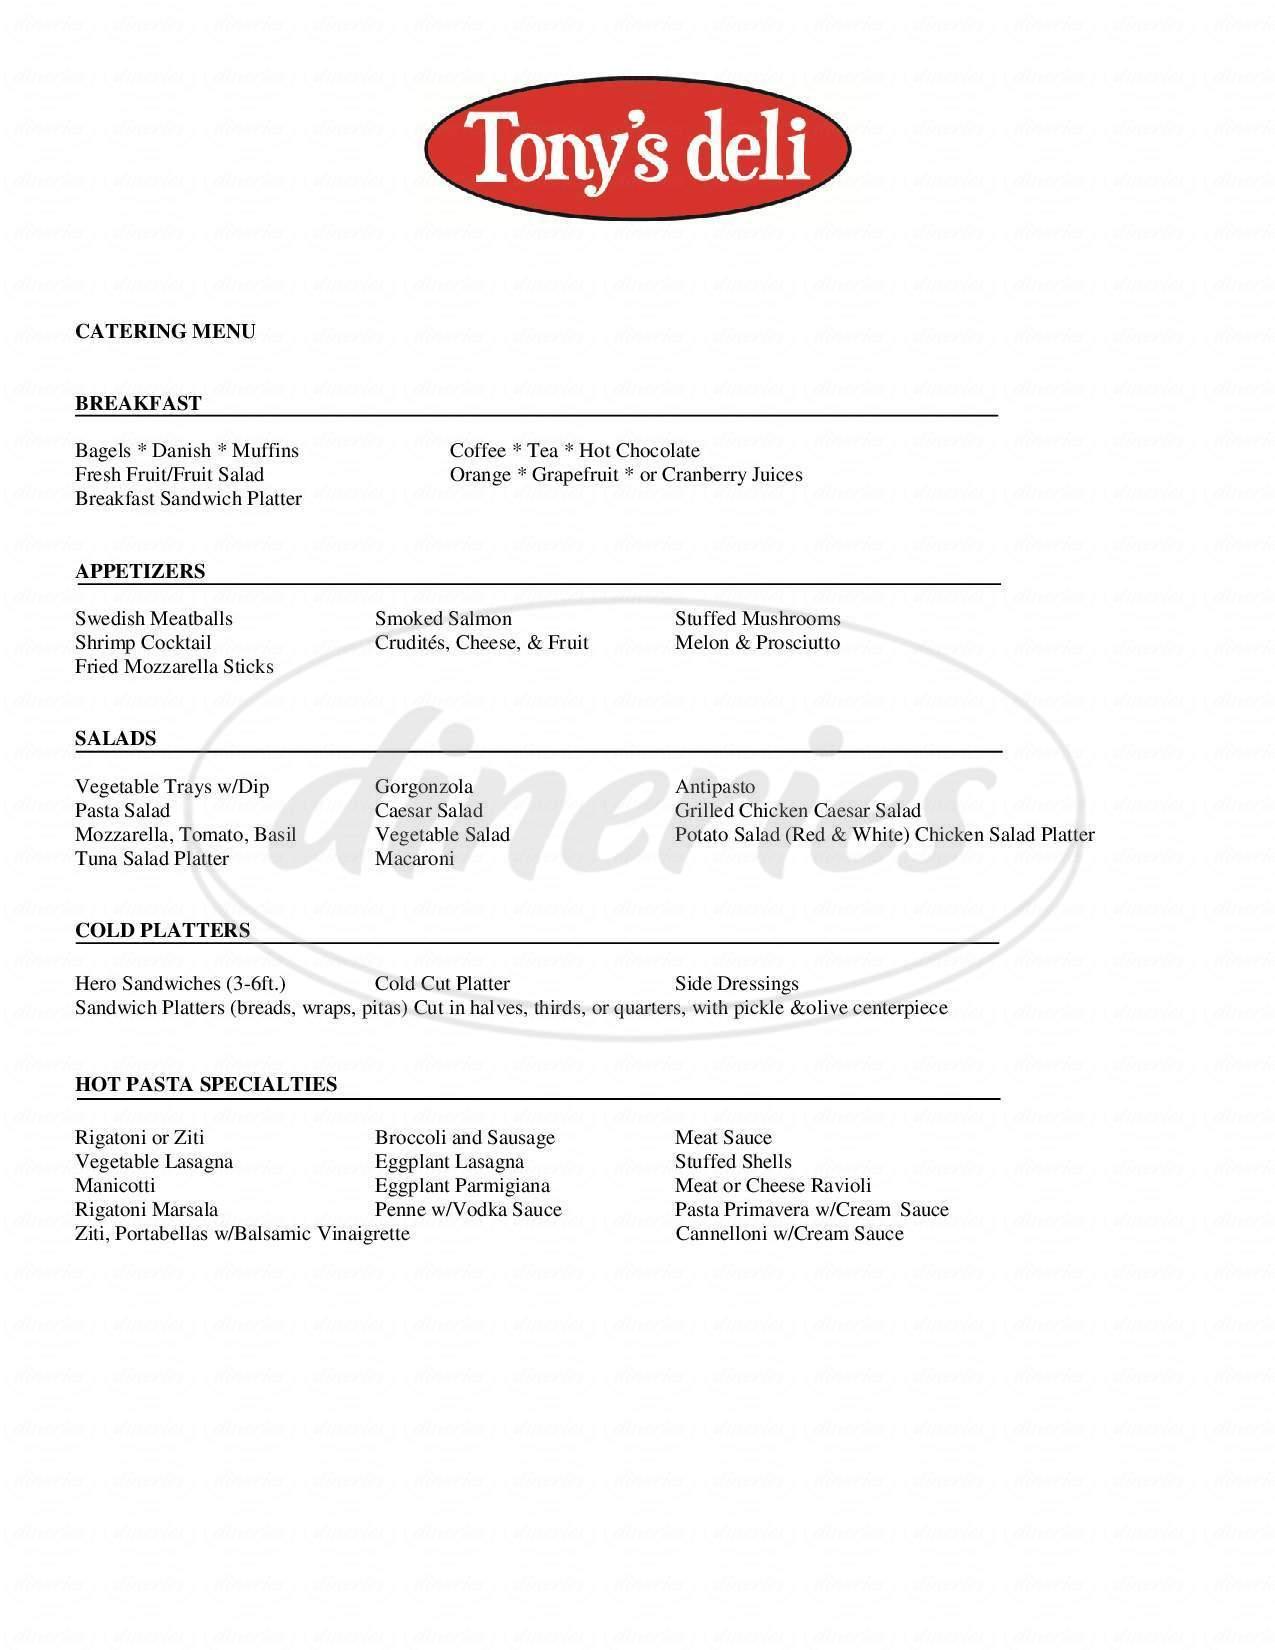 menu for Tony's Deli